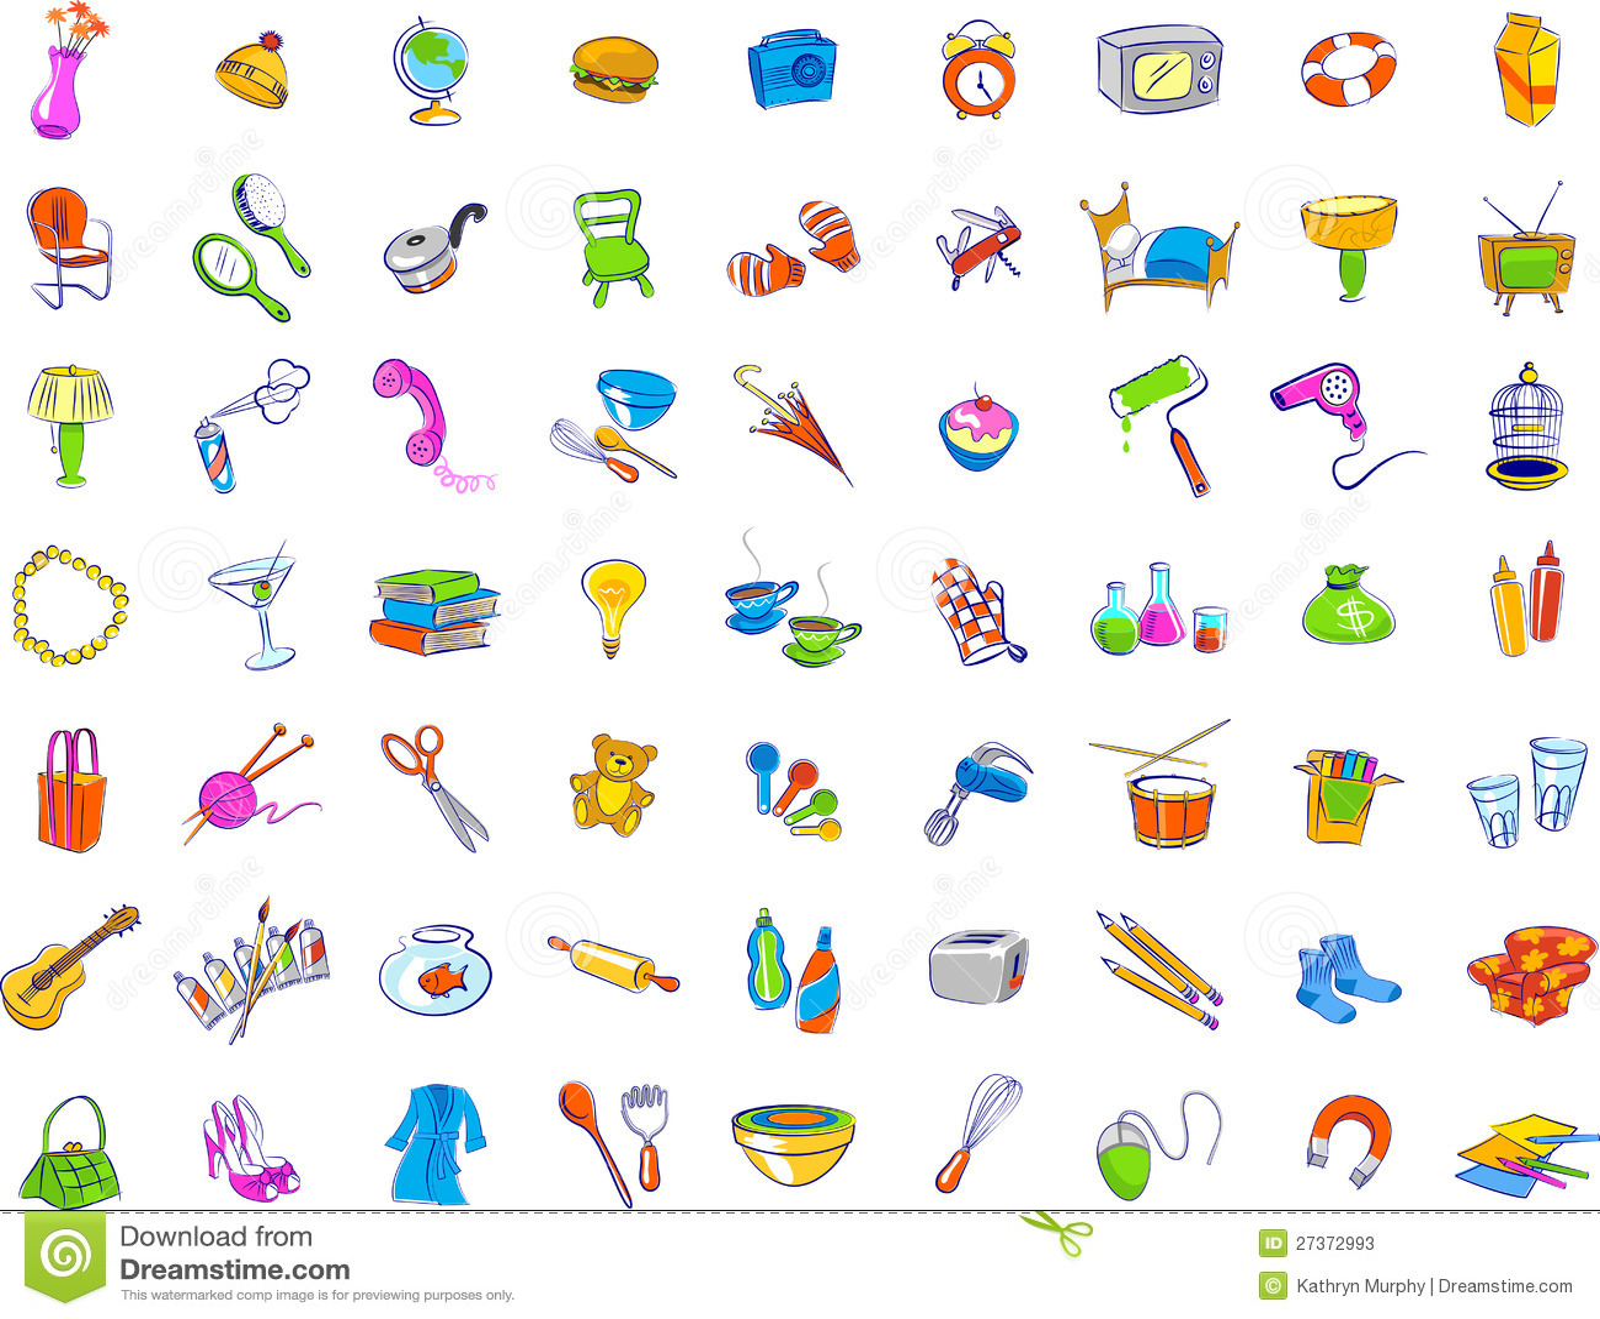 Bathroom Designers Everyday Objects Icons Stock Photos Image 27372993